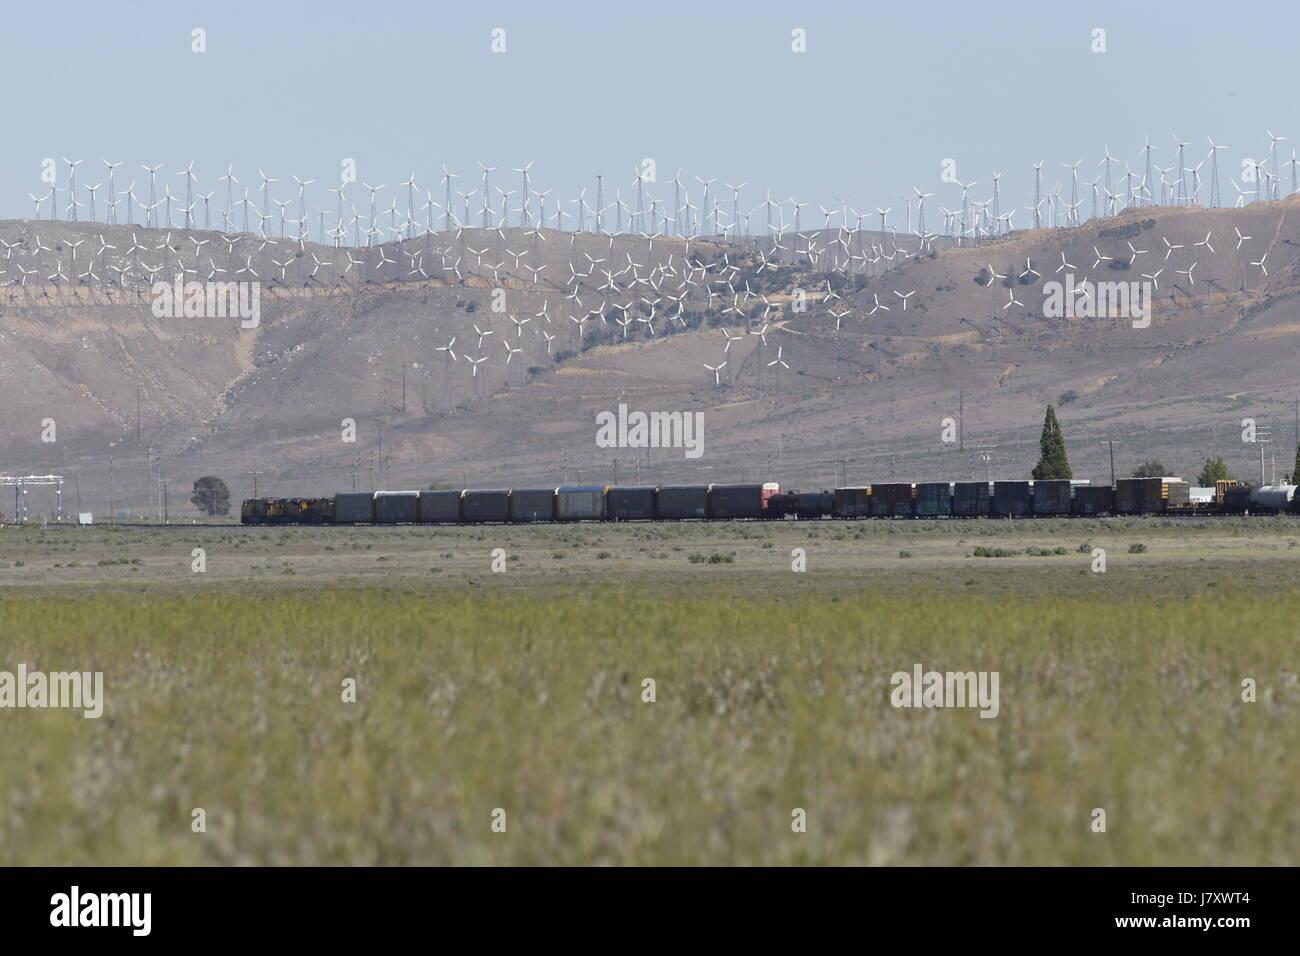 Tehachapi, CA. April 30, 2017. A cargo train passes beneath windmills in the Tehachapi Wind Resource Area, California's - Stock Image